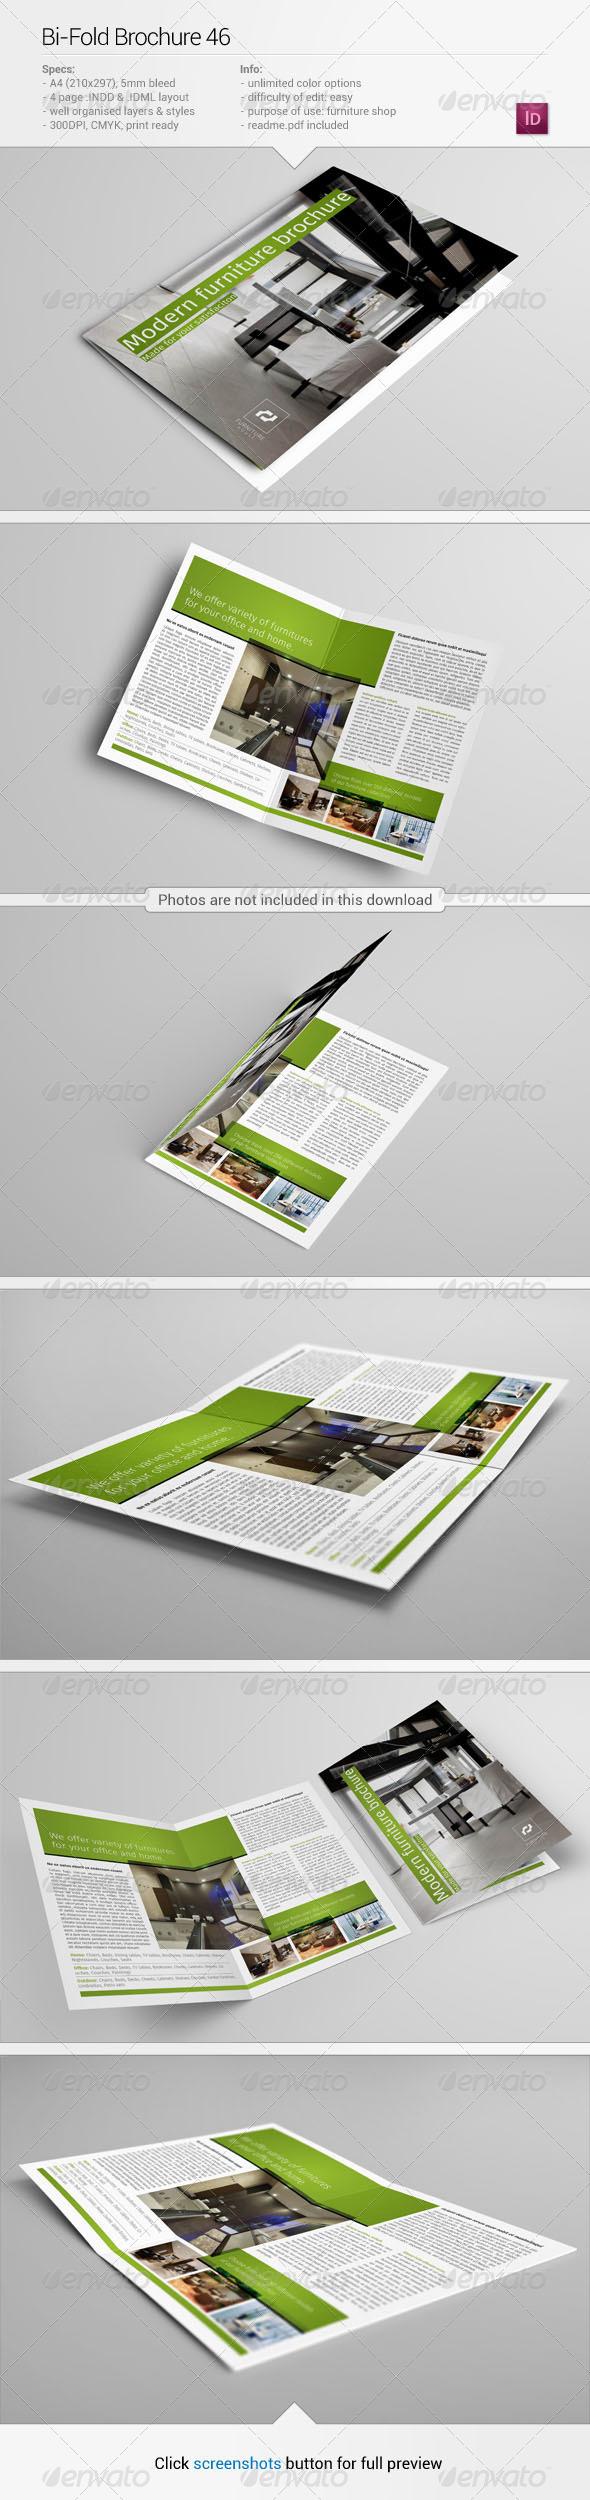 Bi-Fold Brochure 46 - Informational Brochures